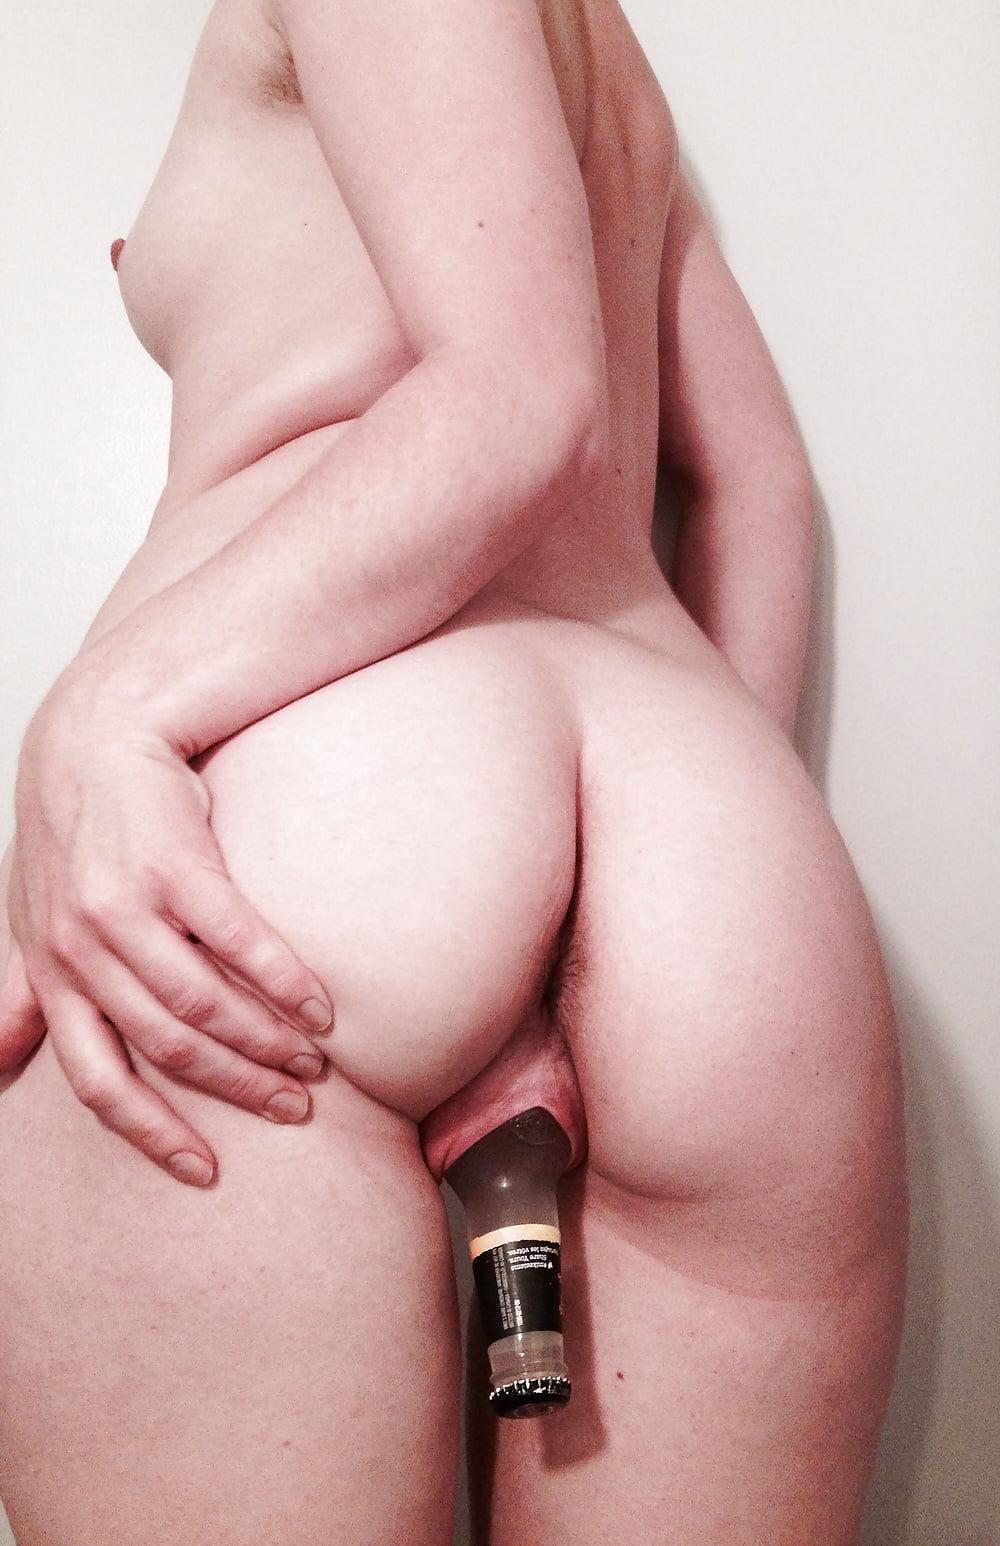 notions-black-bottle-stuck-in-vagina-naked-pics-gina-lynn